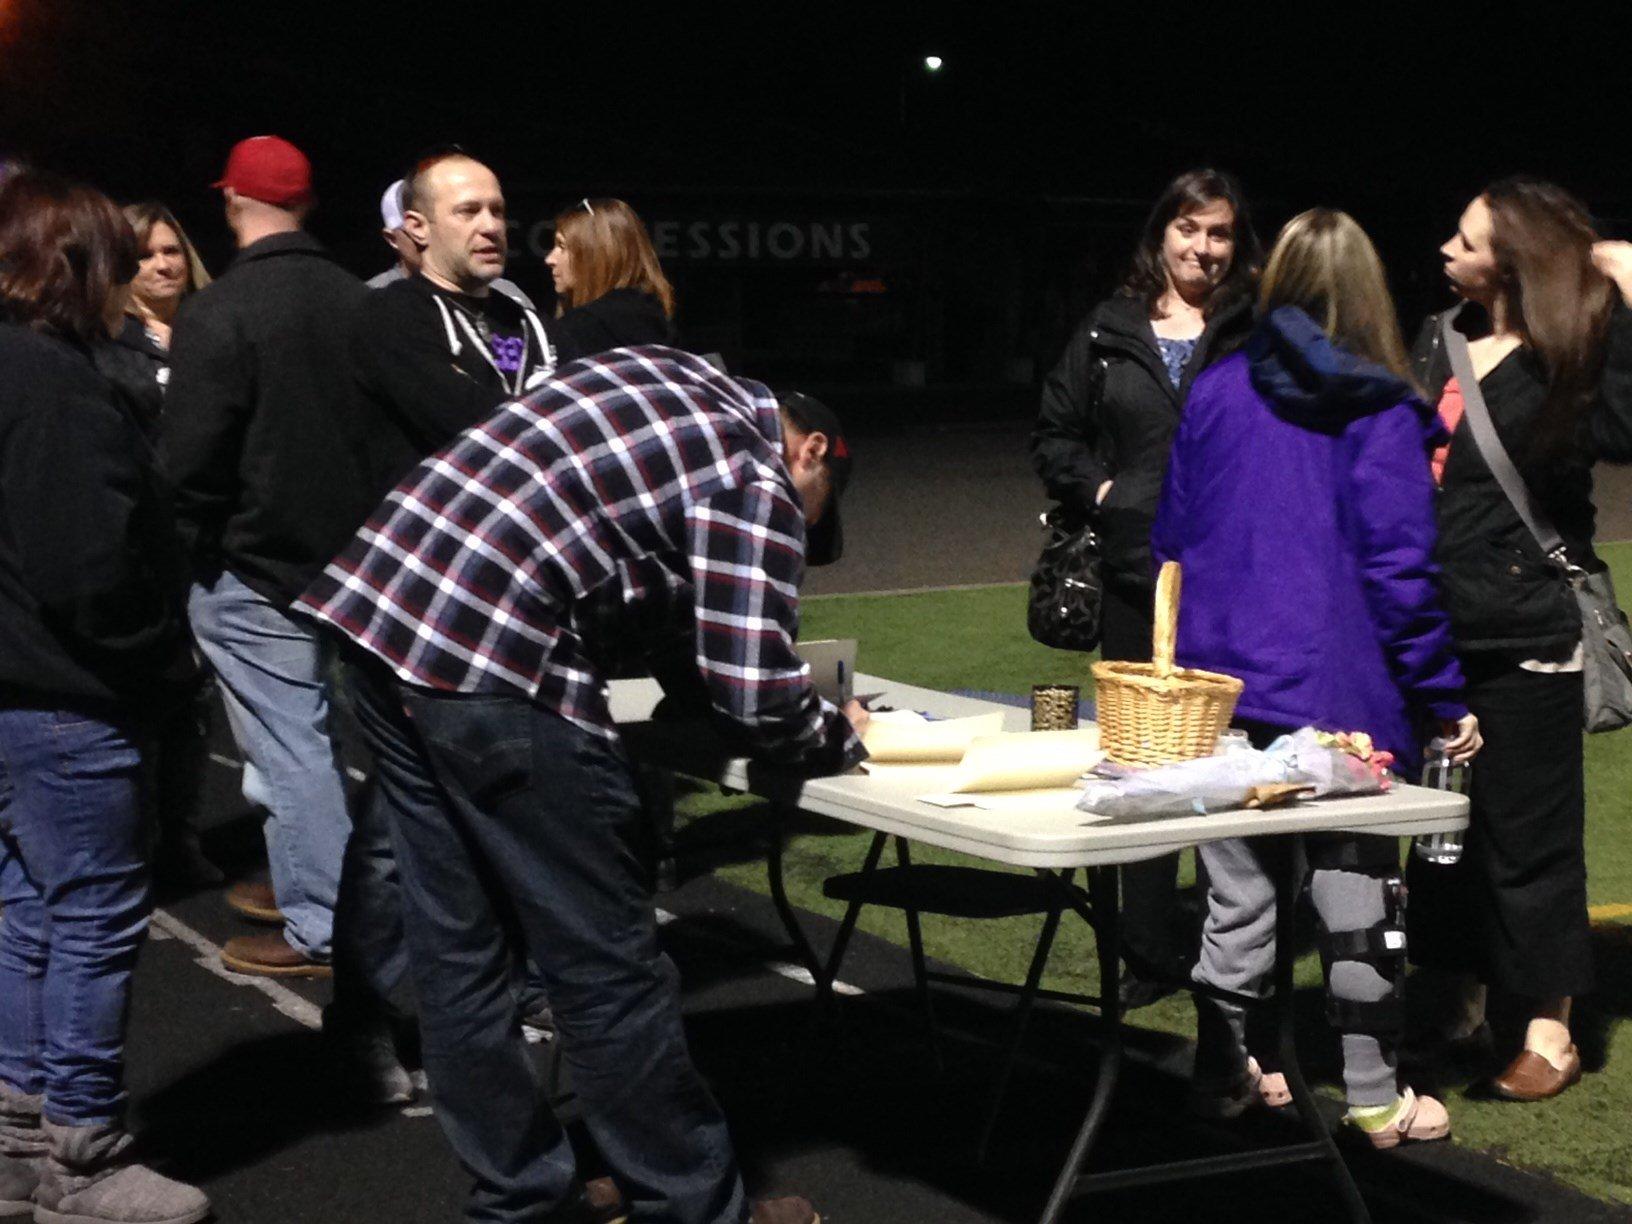 People signing notes at Monday's vigil at Sherwood High School.